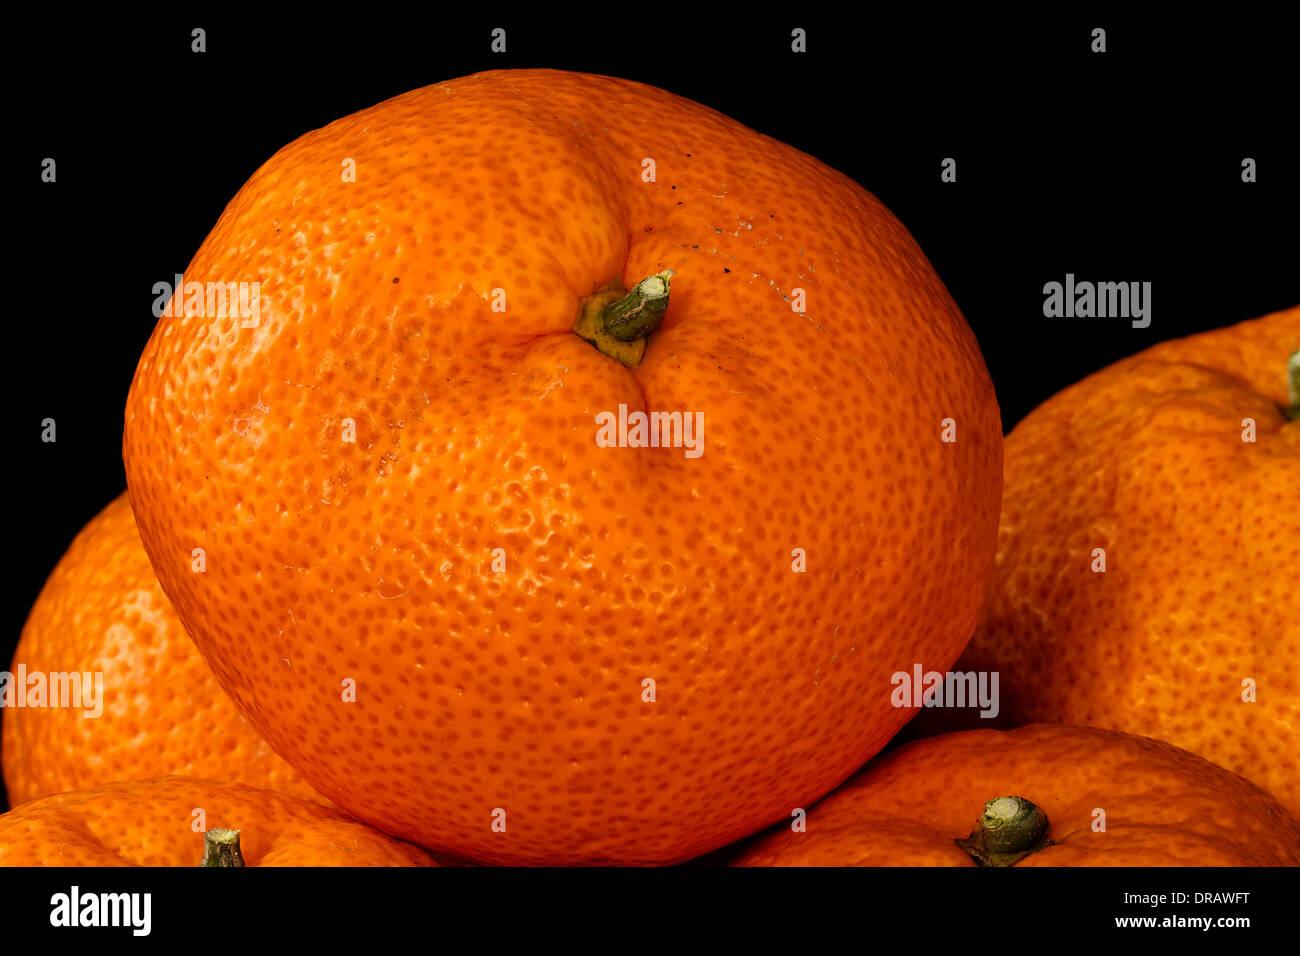 Fresh Mandarin Orange - Stock Image